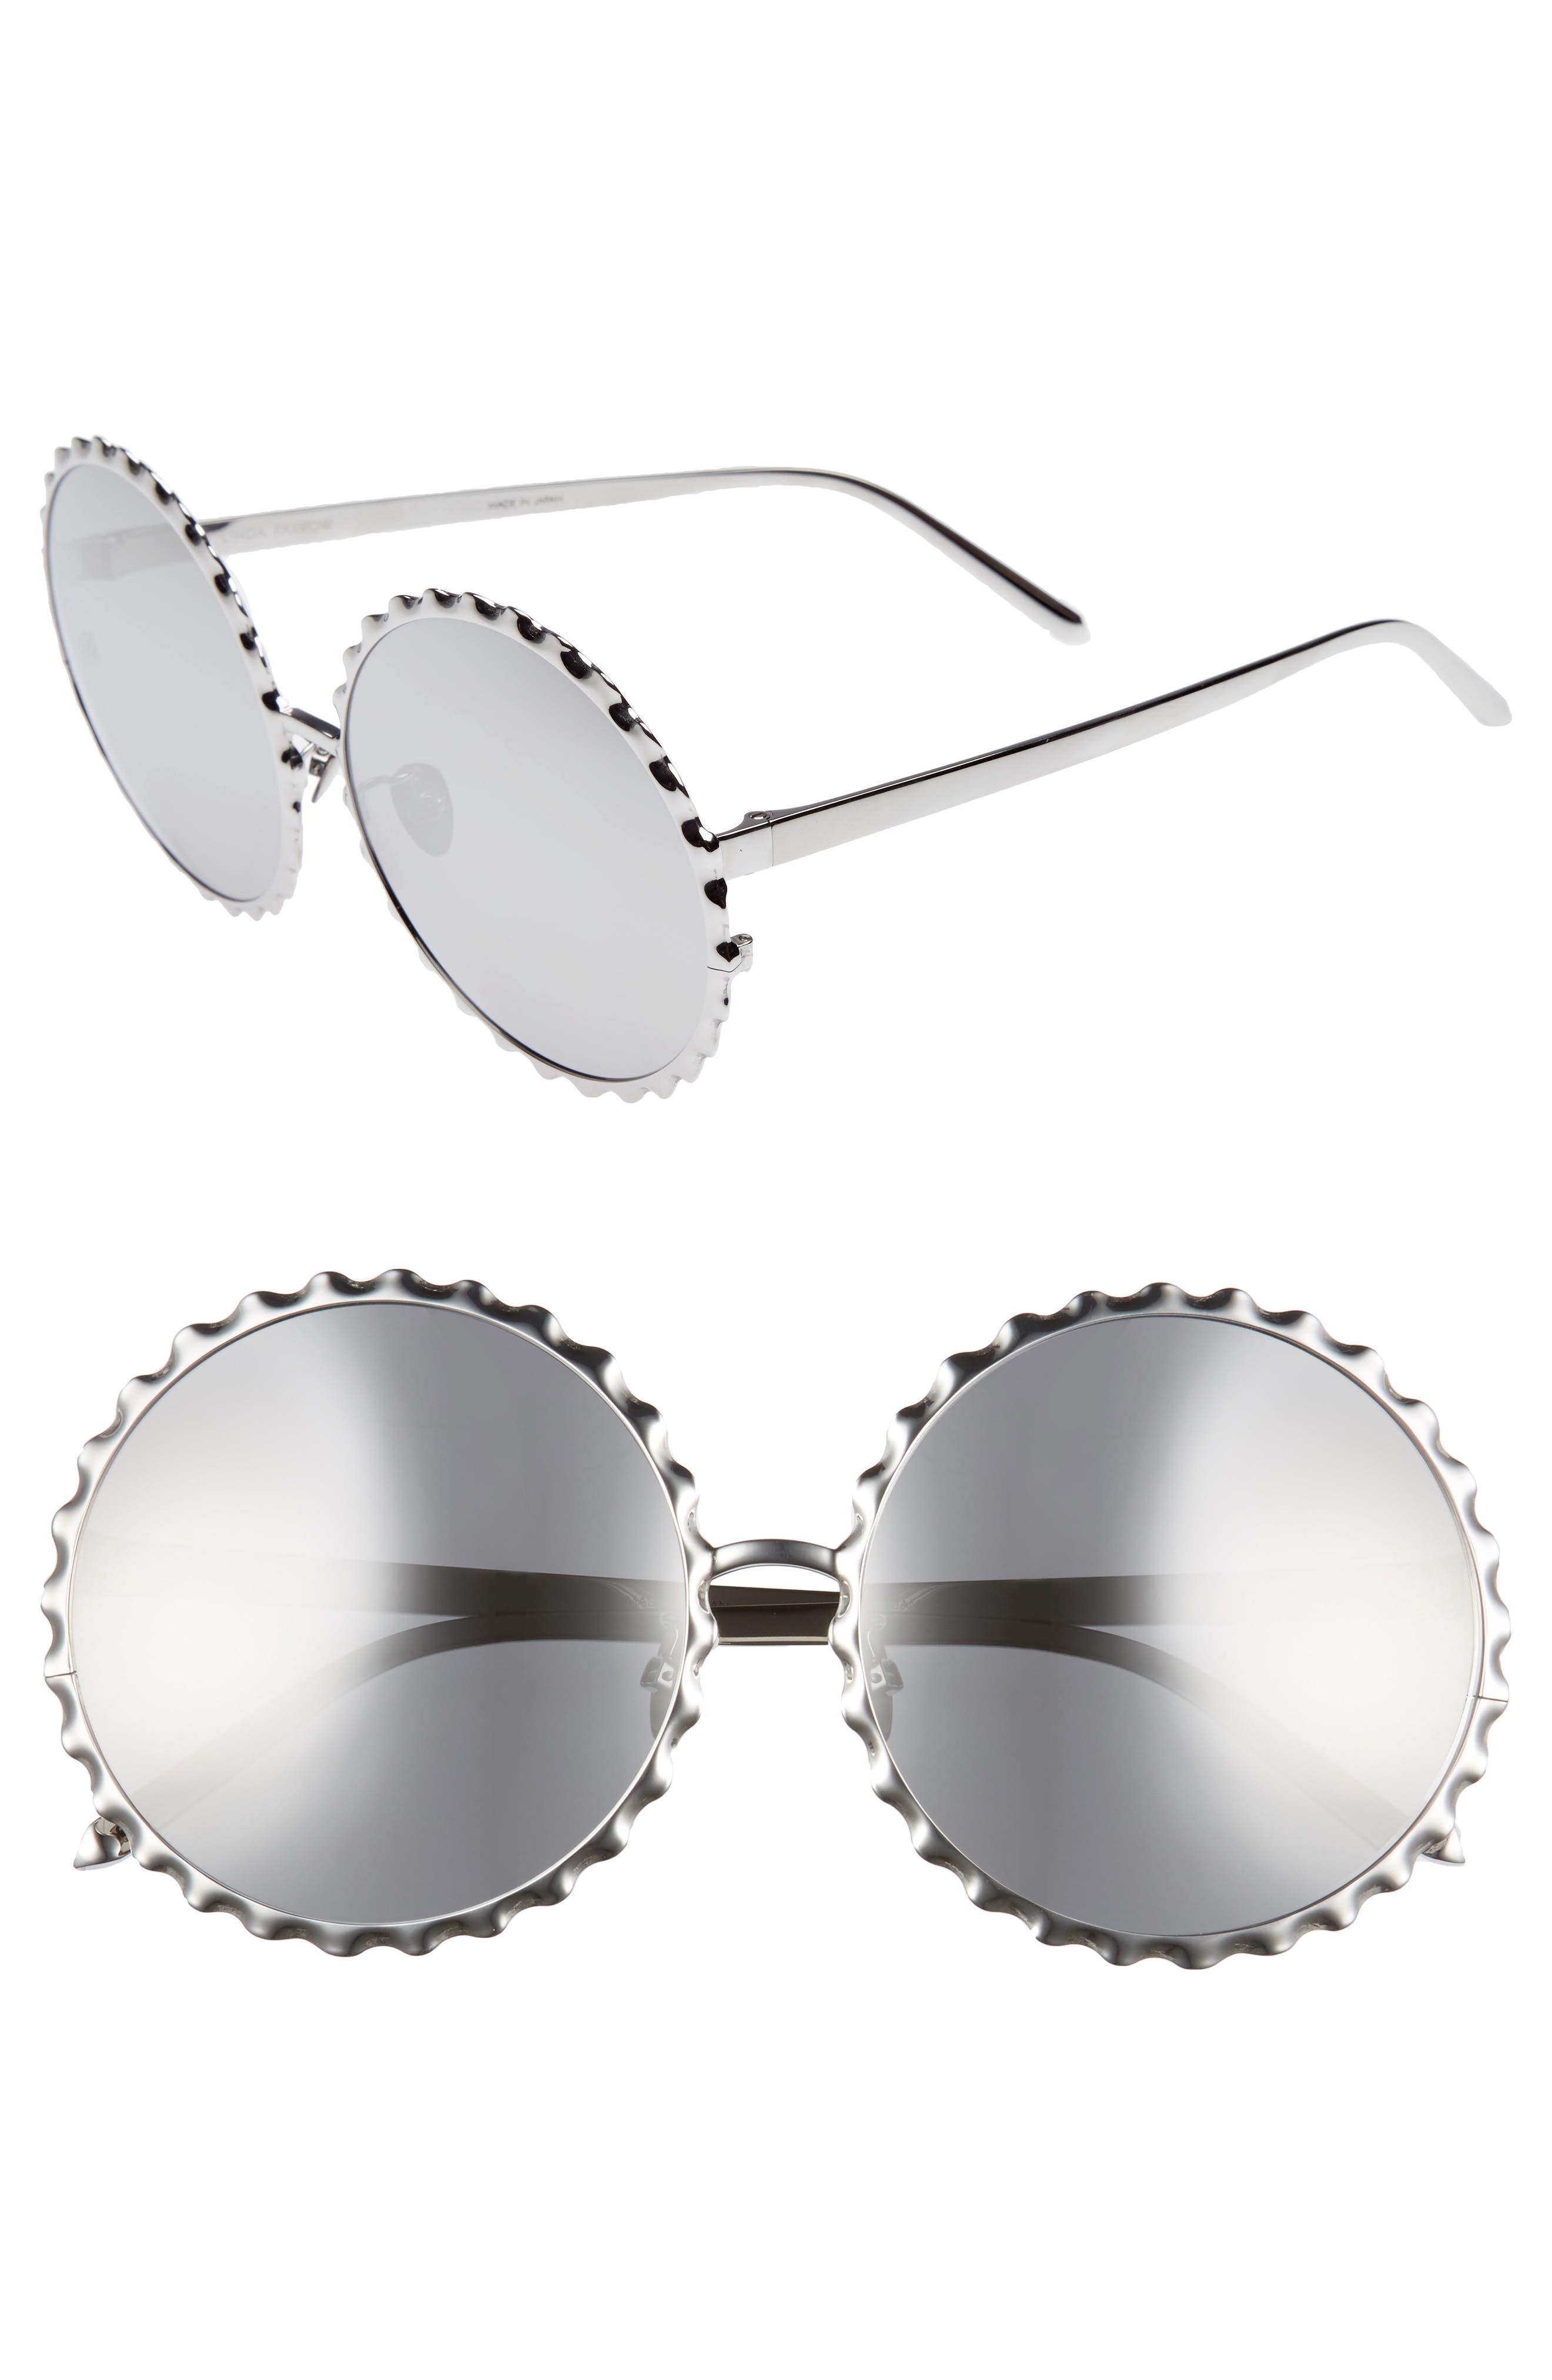 59mm Mirrored 18 Karat Gold Trim Round Sunglasses,                             Main thumbnail 1, color,                             White Gold/ Platinum